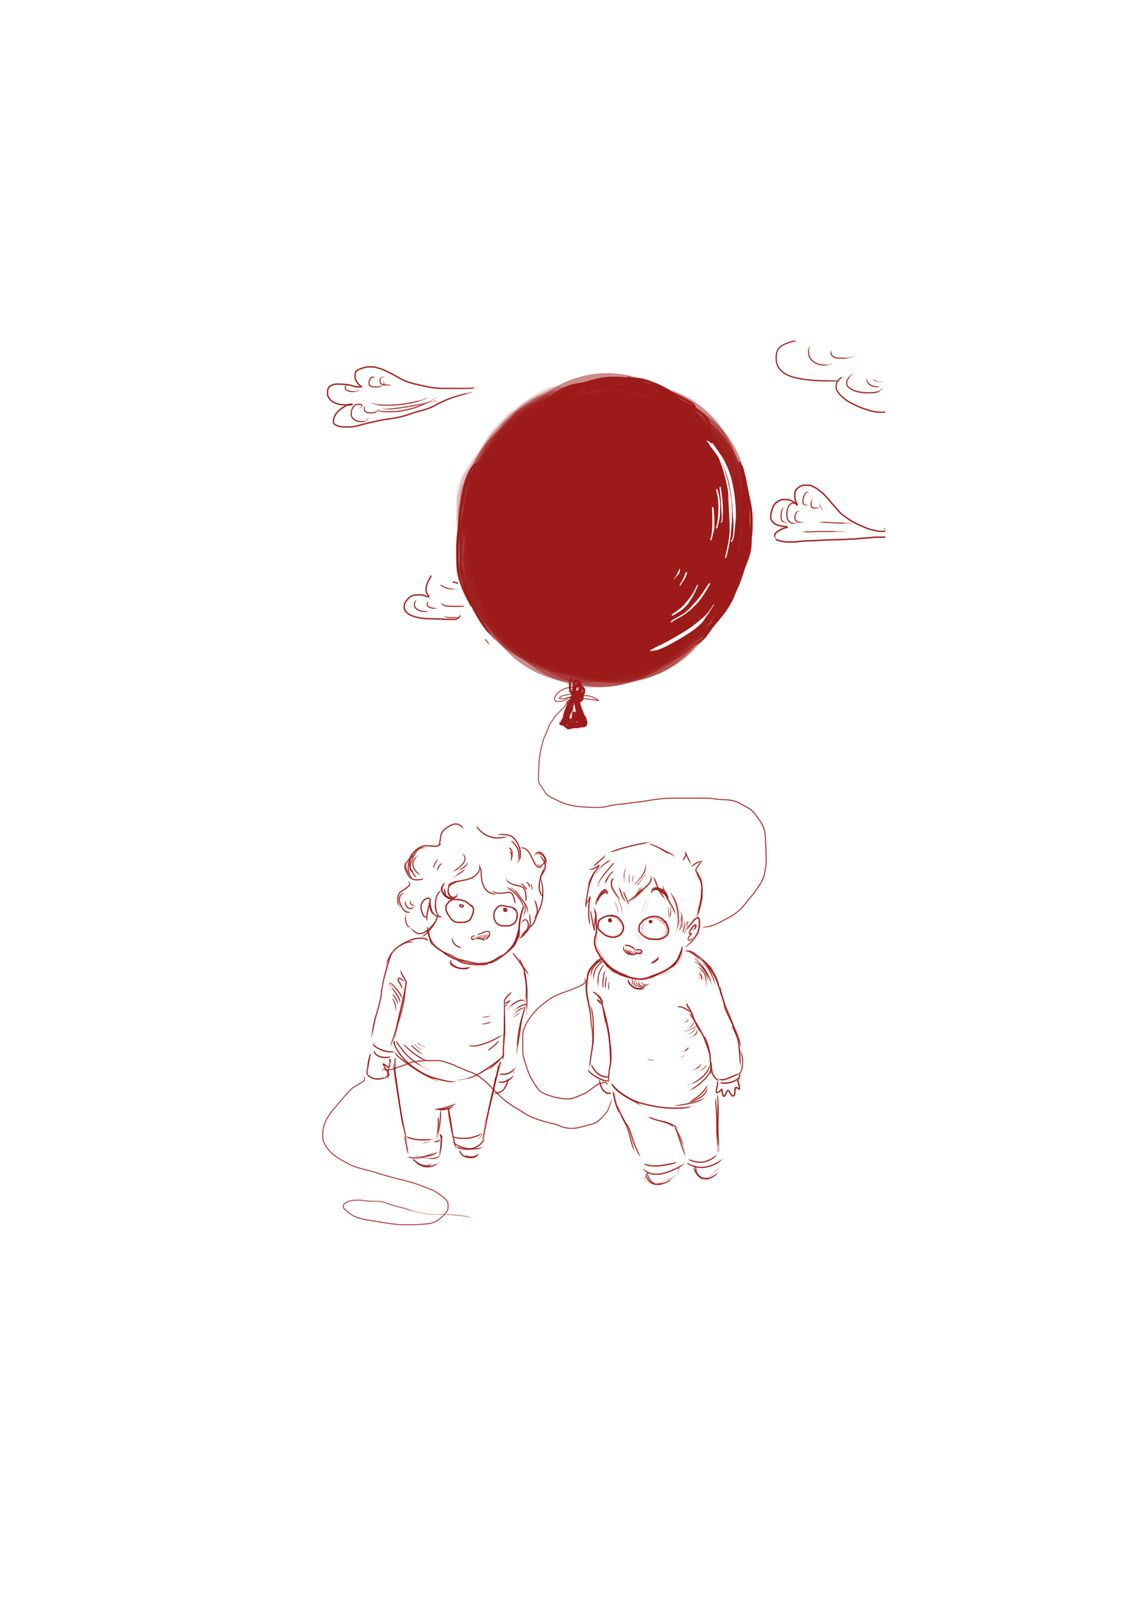 dessin : héloïse, photos : flora, blog.radikal.com.tr